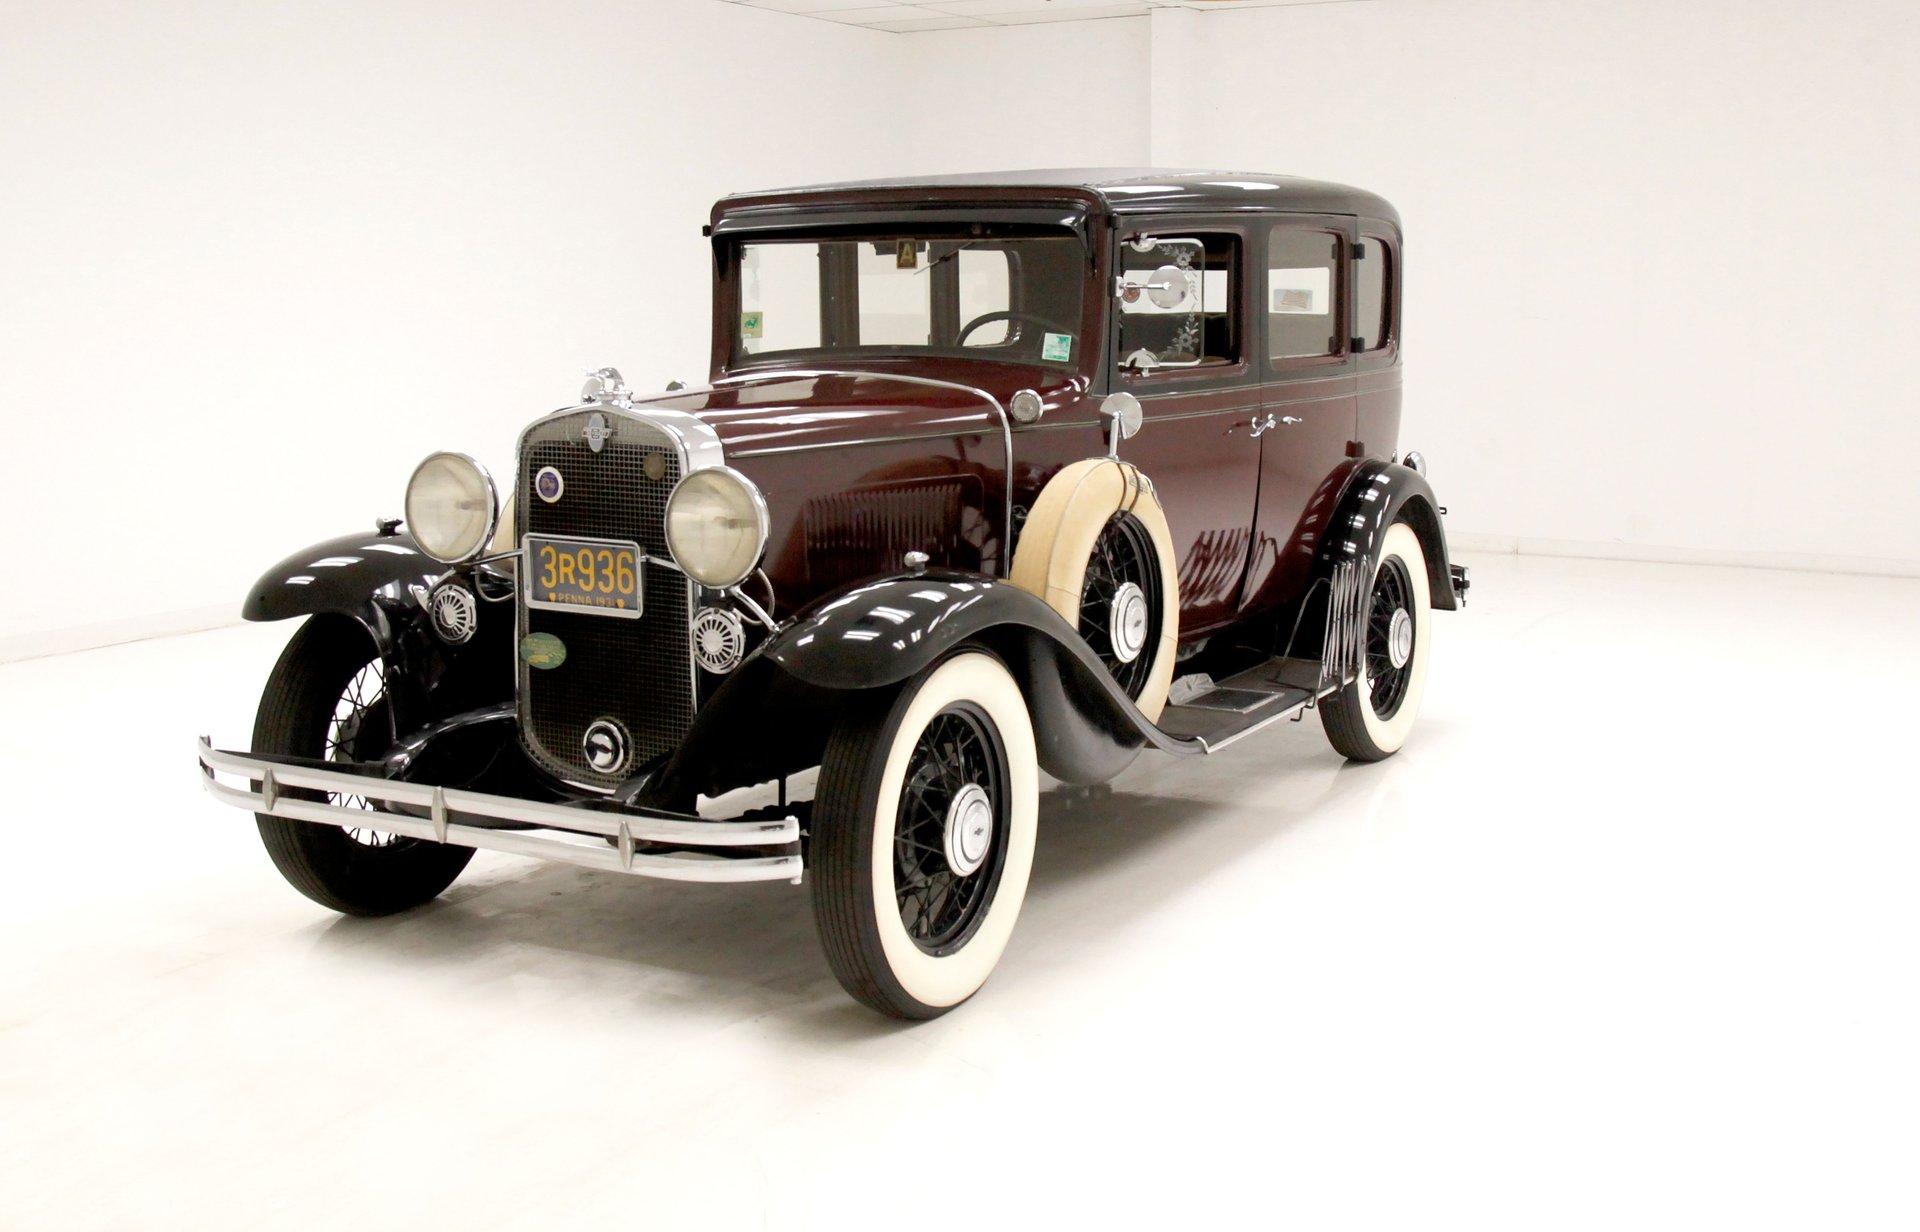 1931 Chevrolet Special